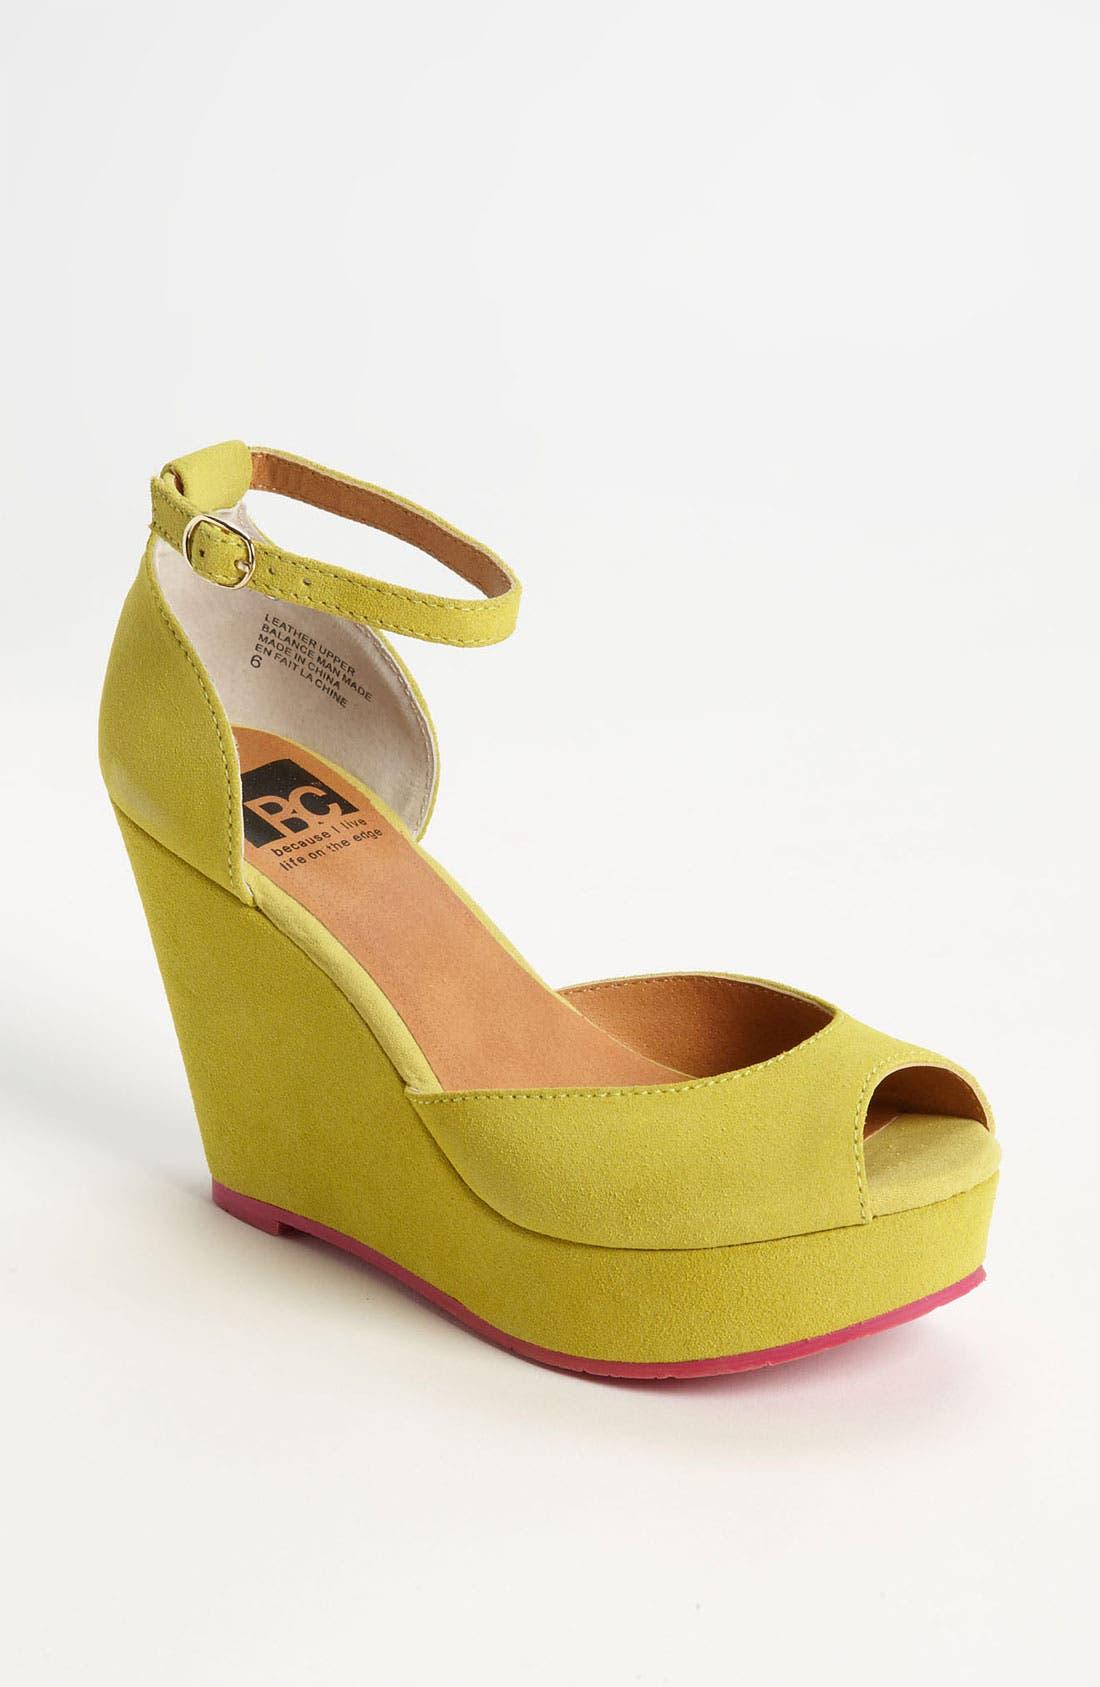 Alternate Image 1 Selected - BC Footwear 'Bright Idea' Wedge Sandal